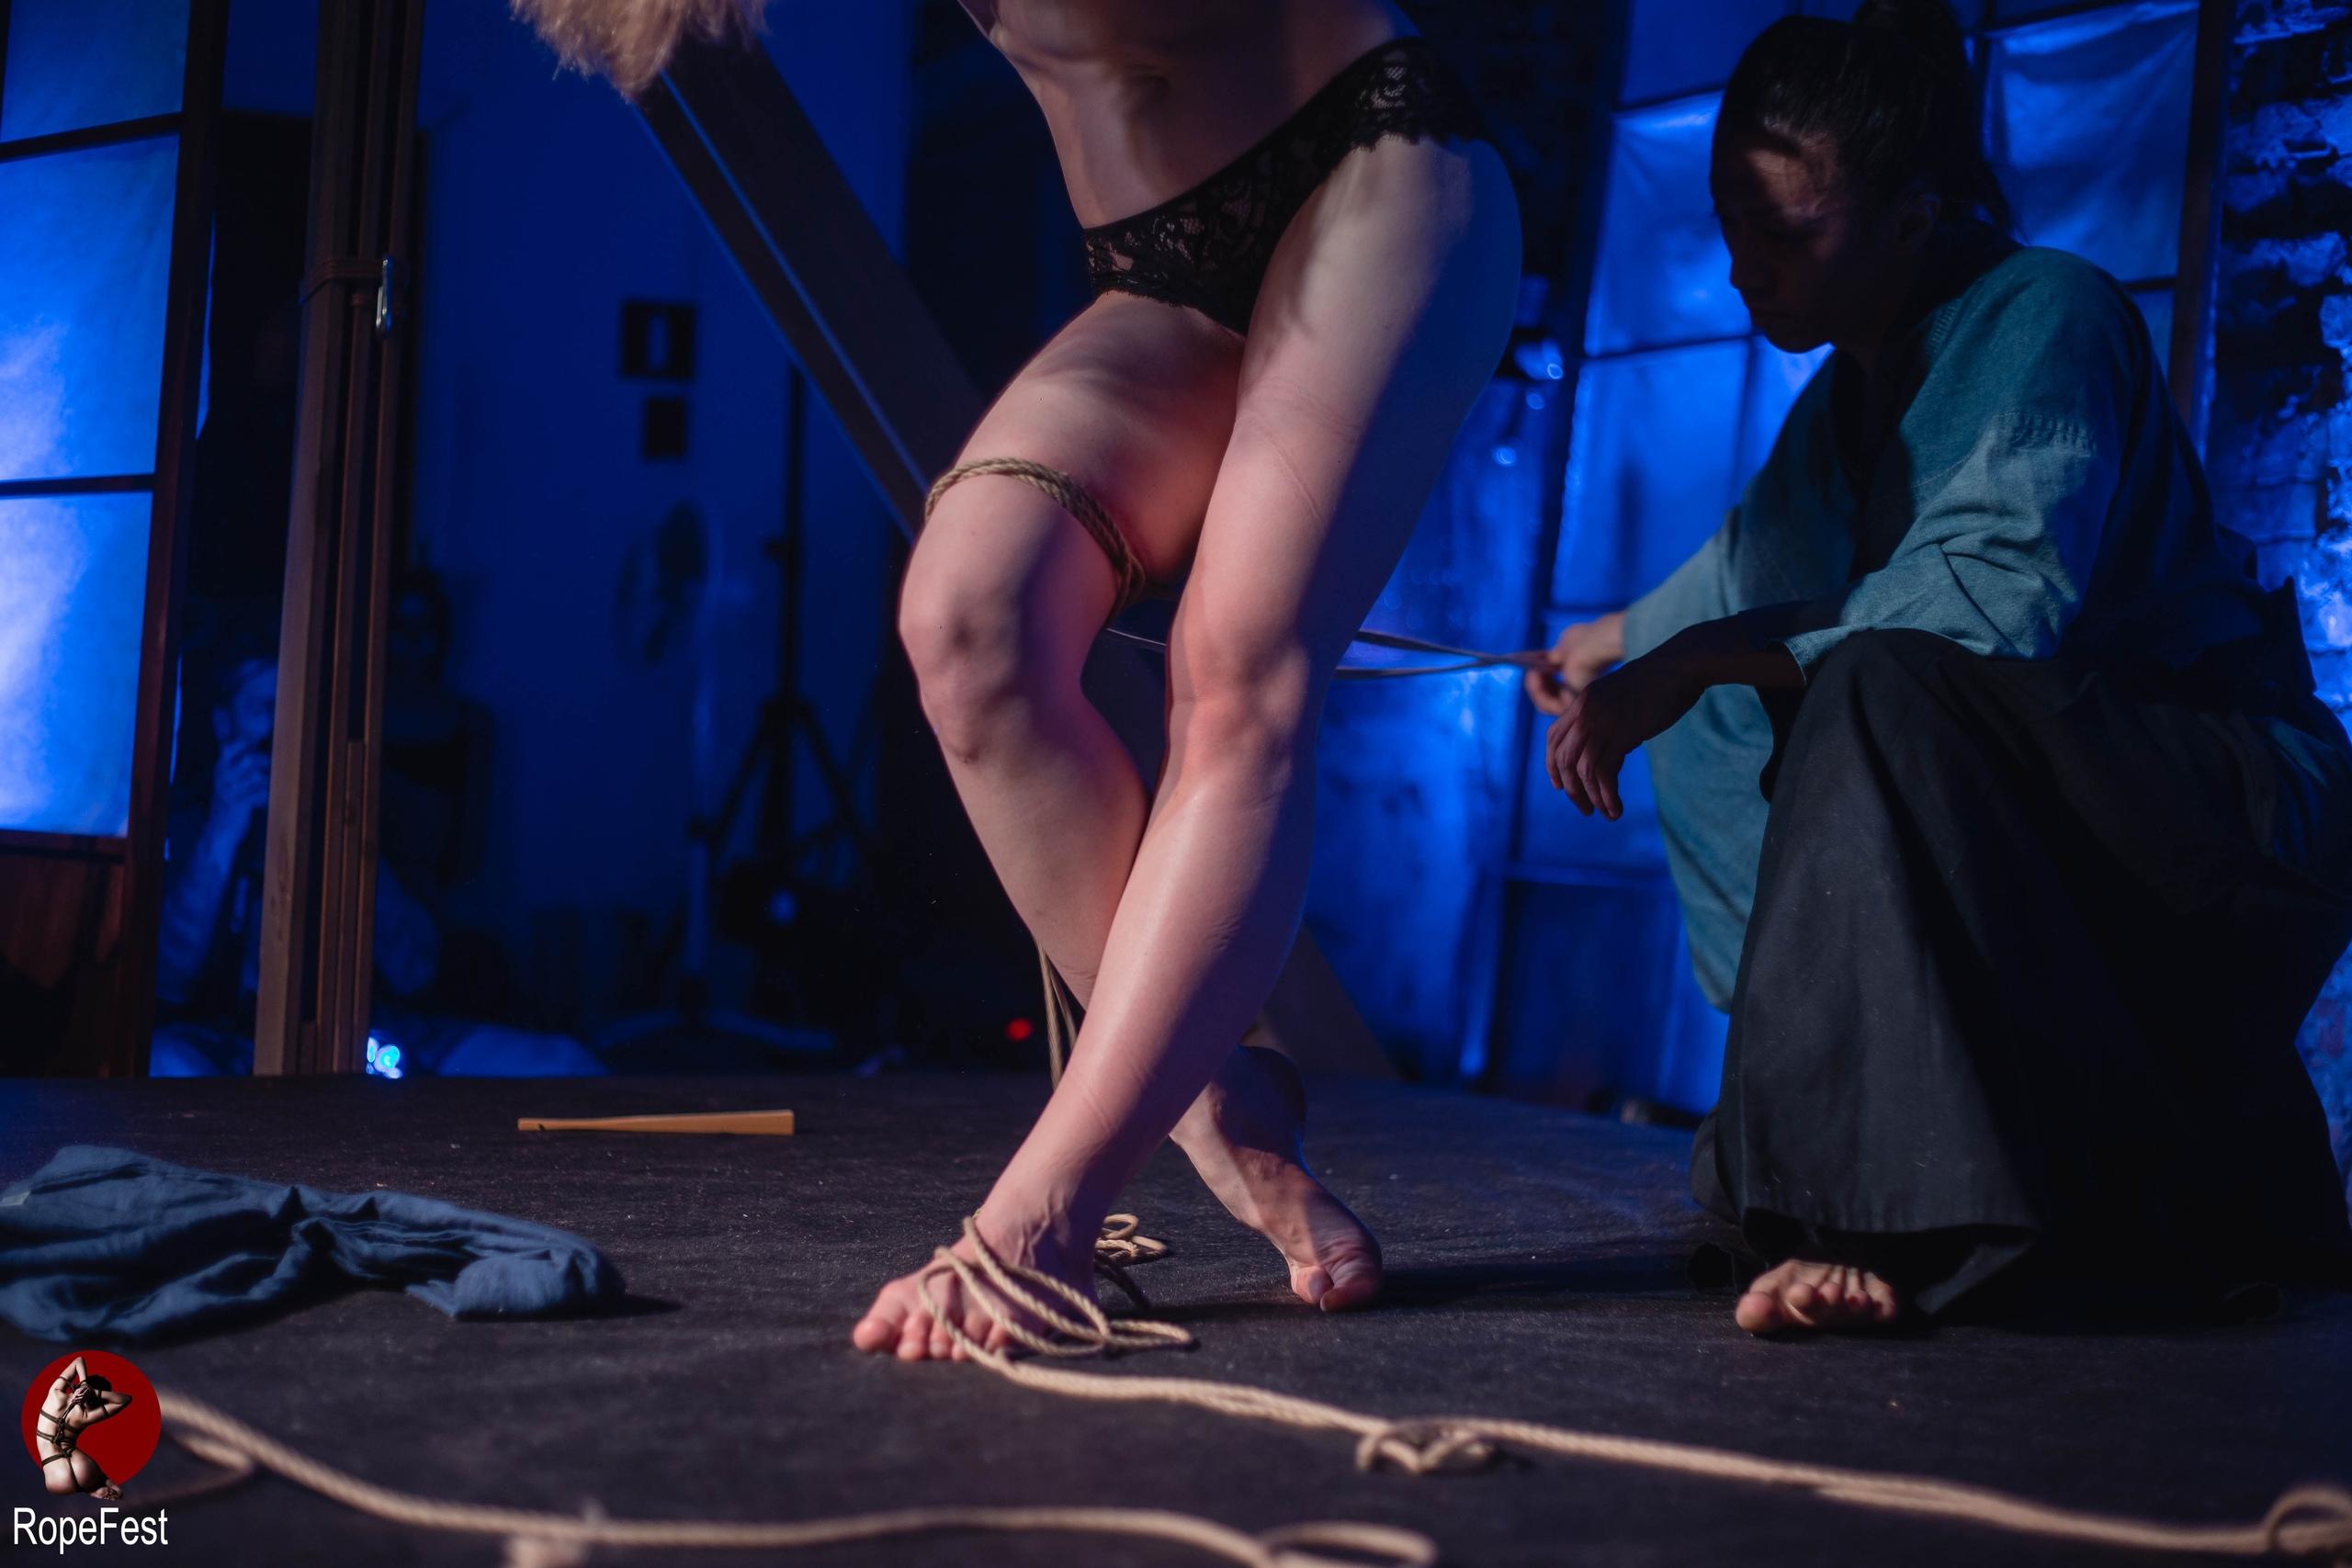 Rope Fest Peterburg 2019. Bondage: Yagami. Foto by Elizaveta Kuroki